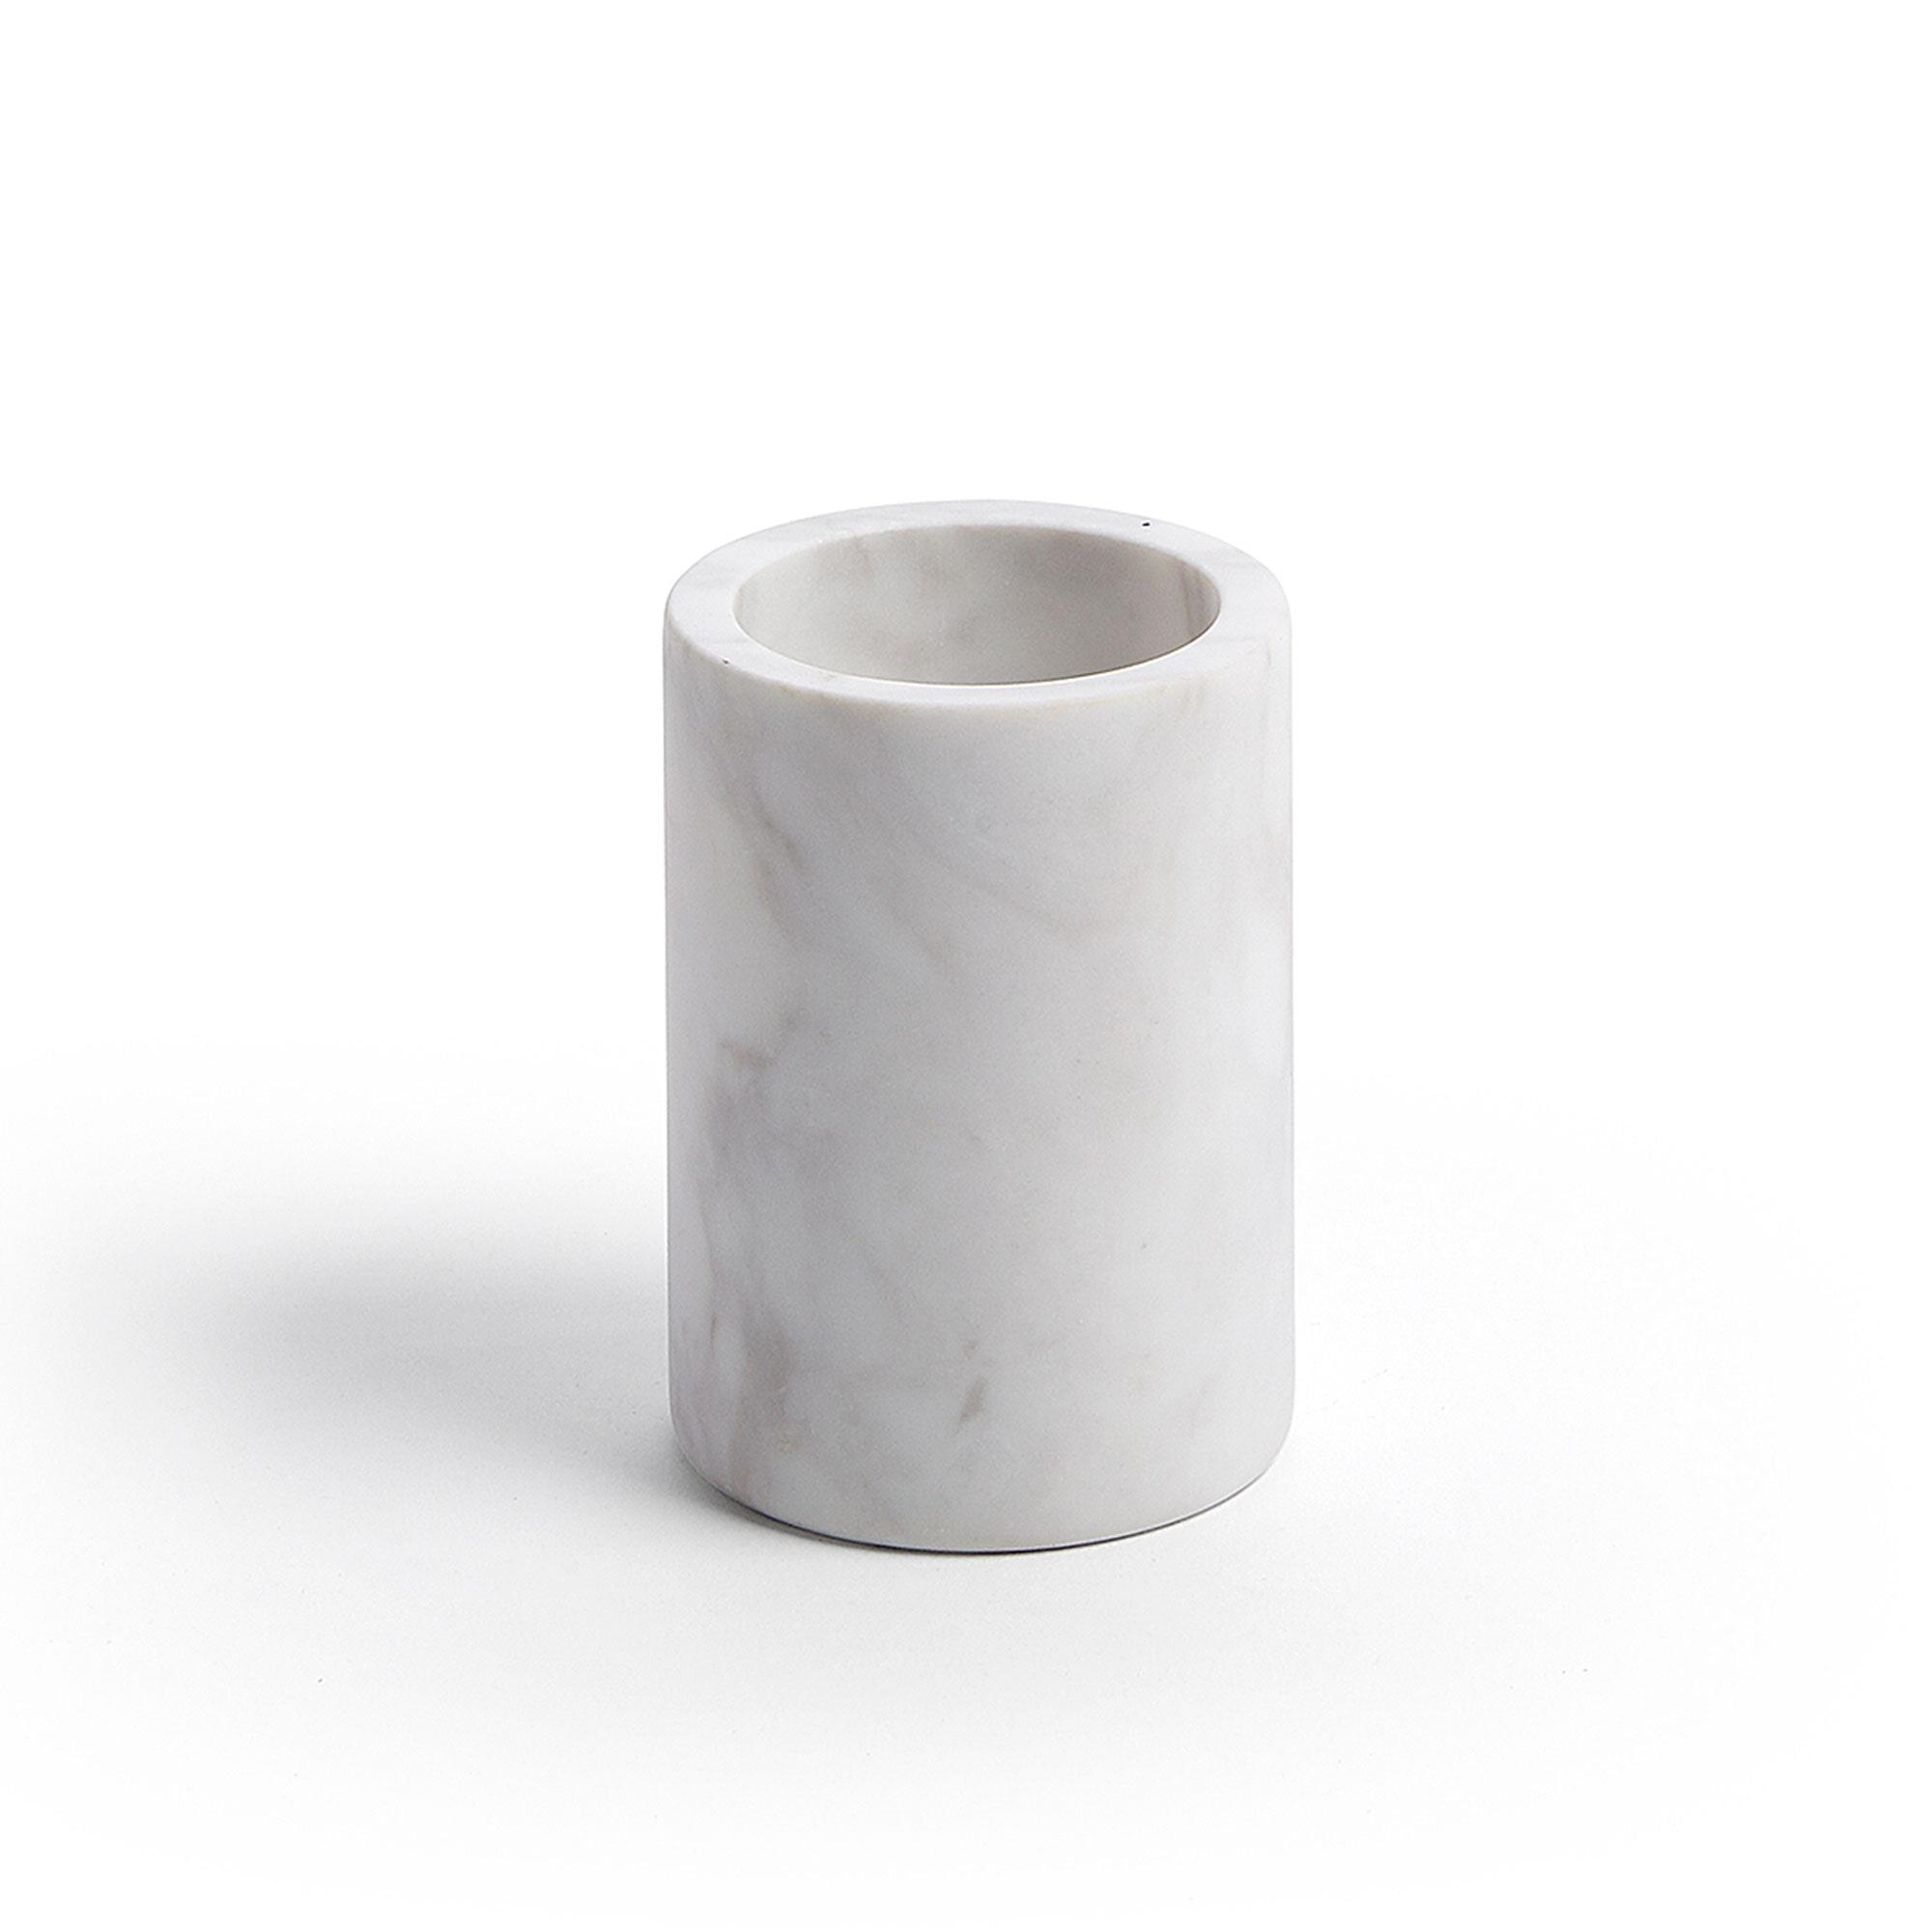 Kave Home Beker 'Almond' kleur Wit